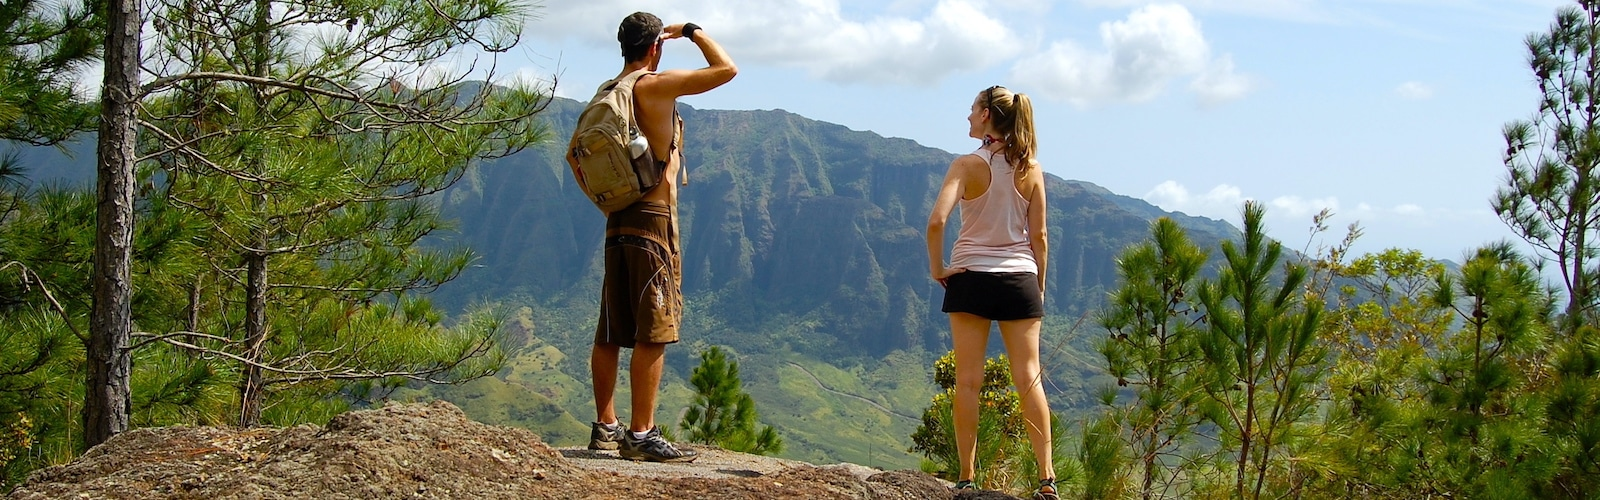 Oahu Easy Hikes, Honolulu, Hawaii